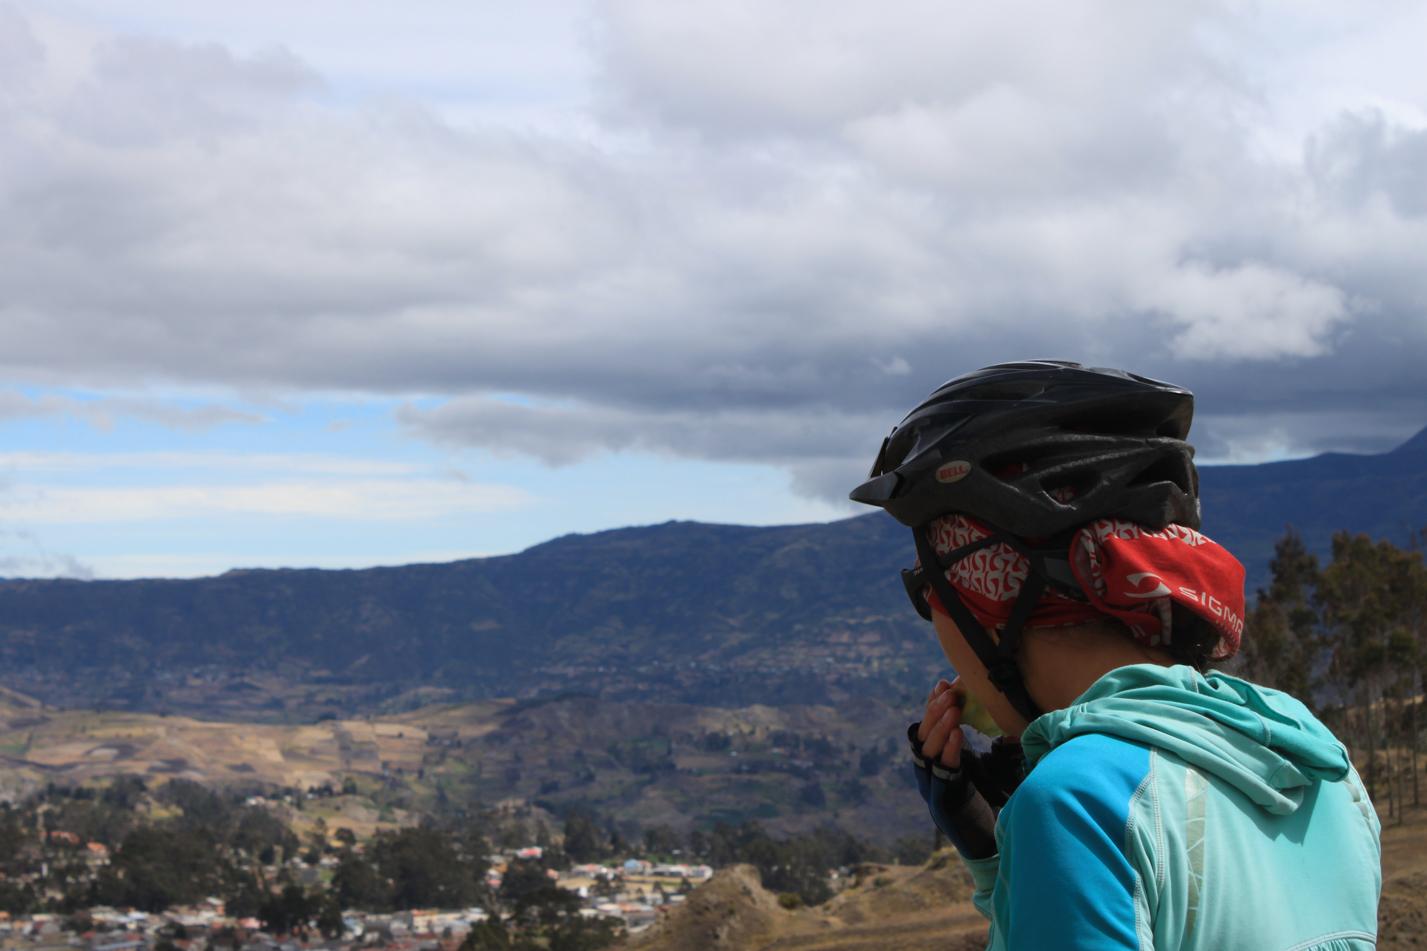 Ingapirka nach Cuenca